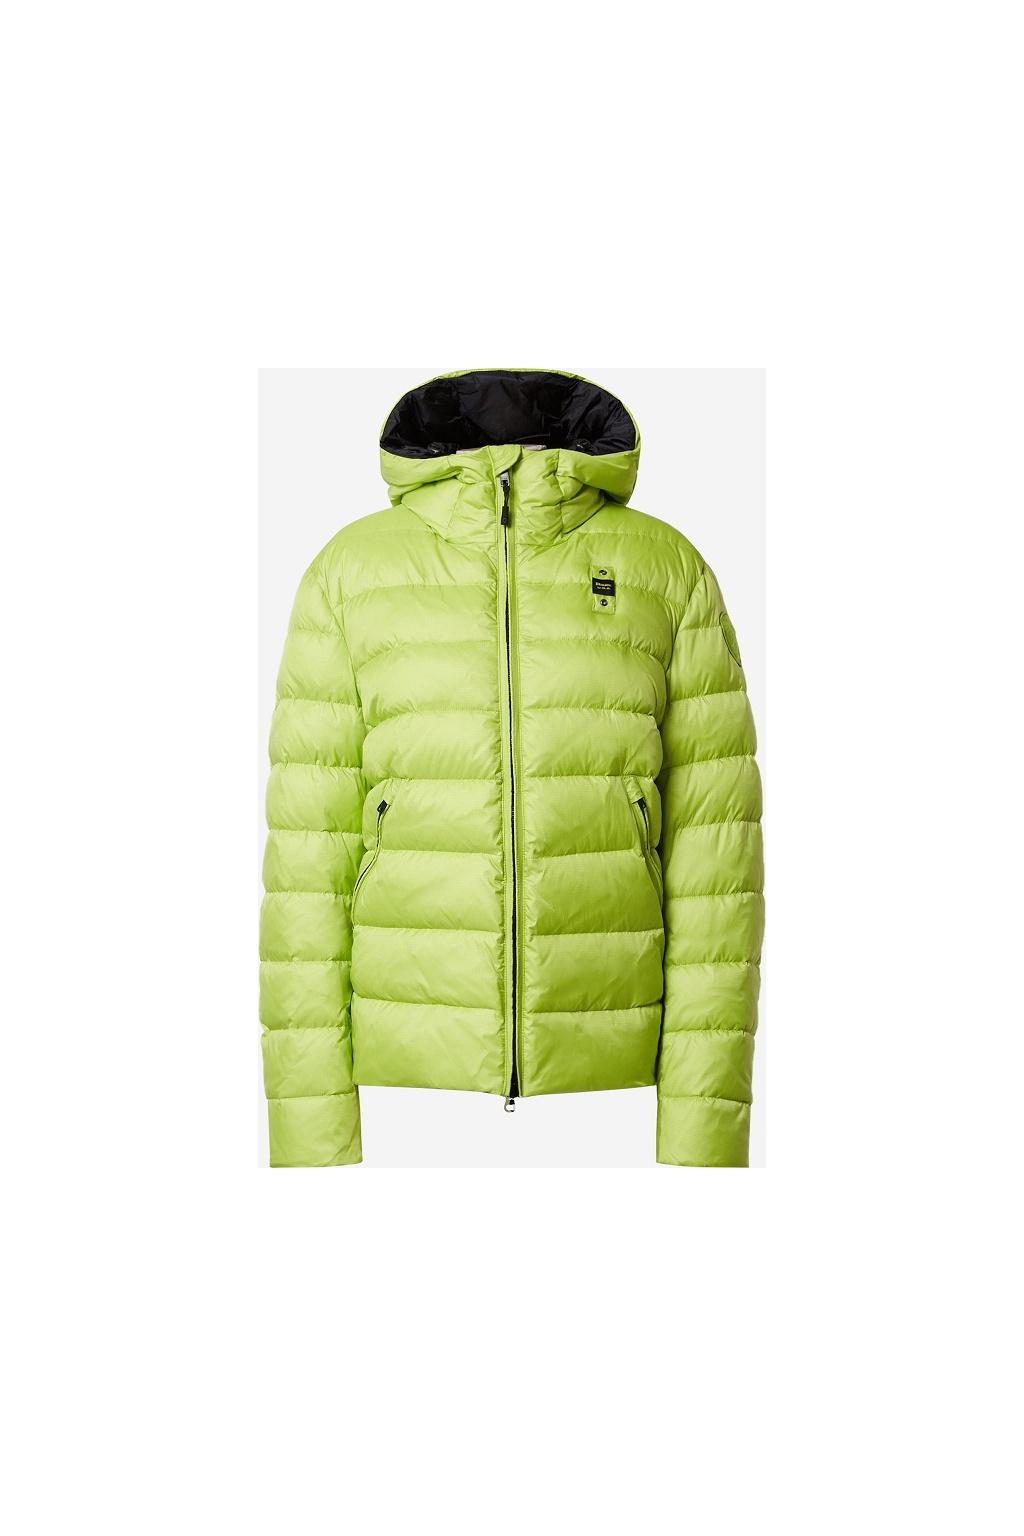 20WBLUC02155 Pánská péřová bunda Blauer zelená